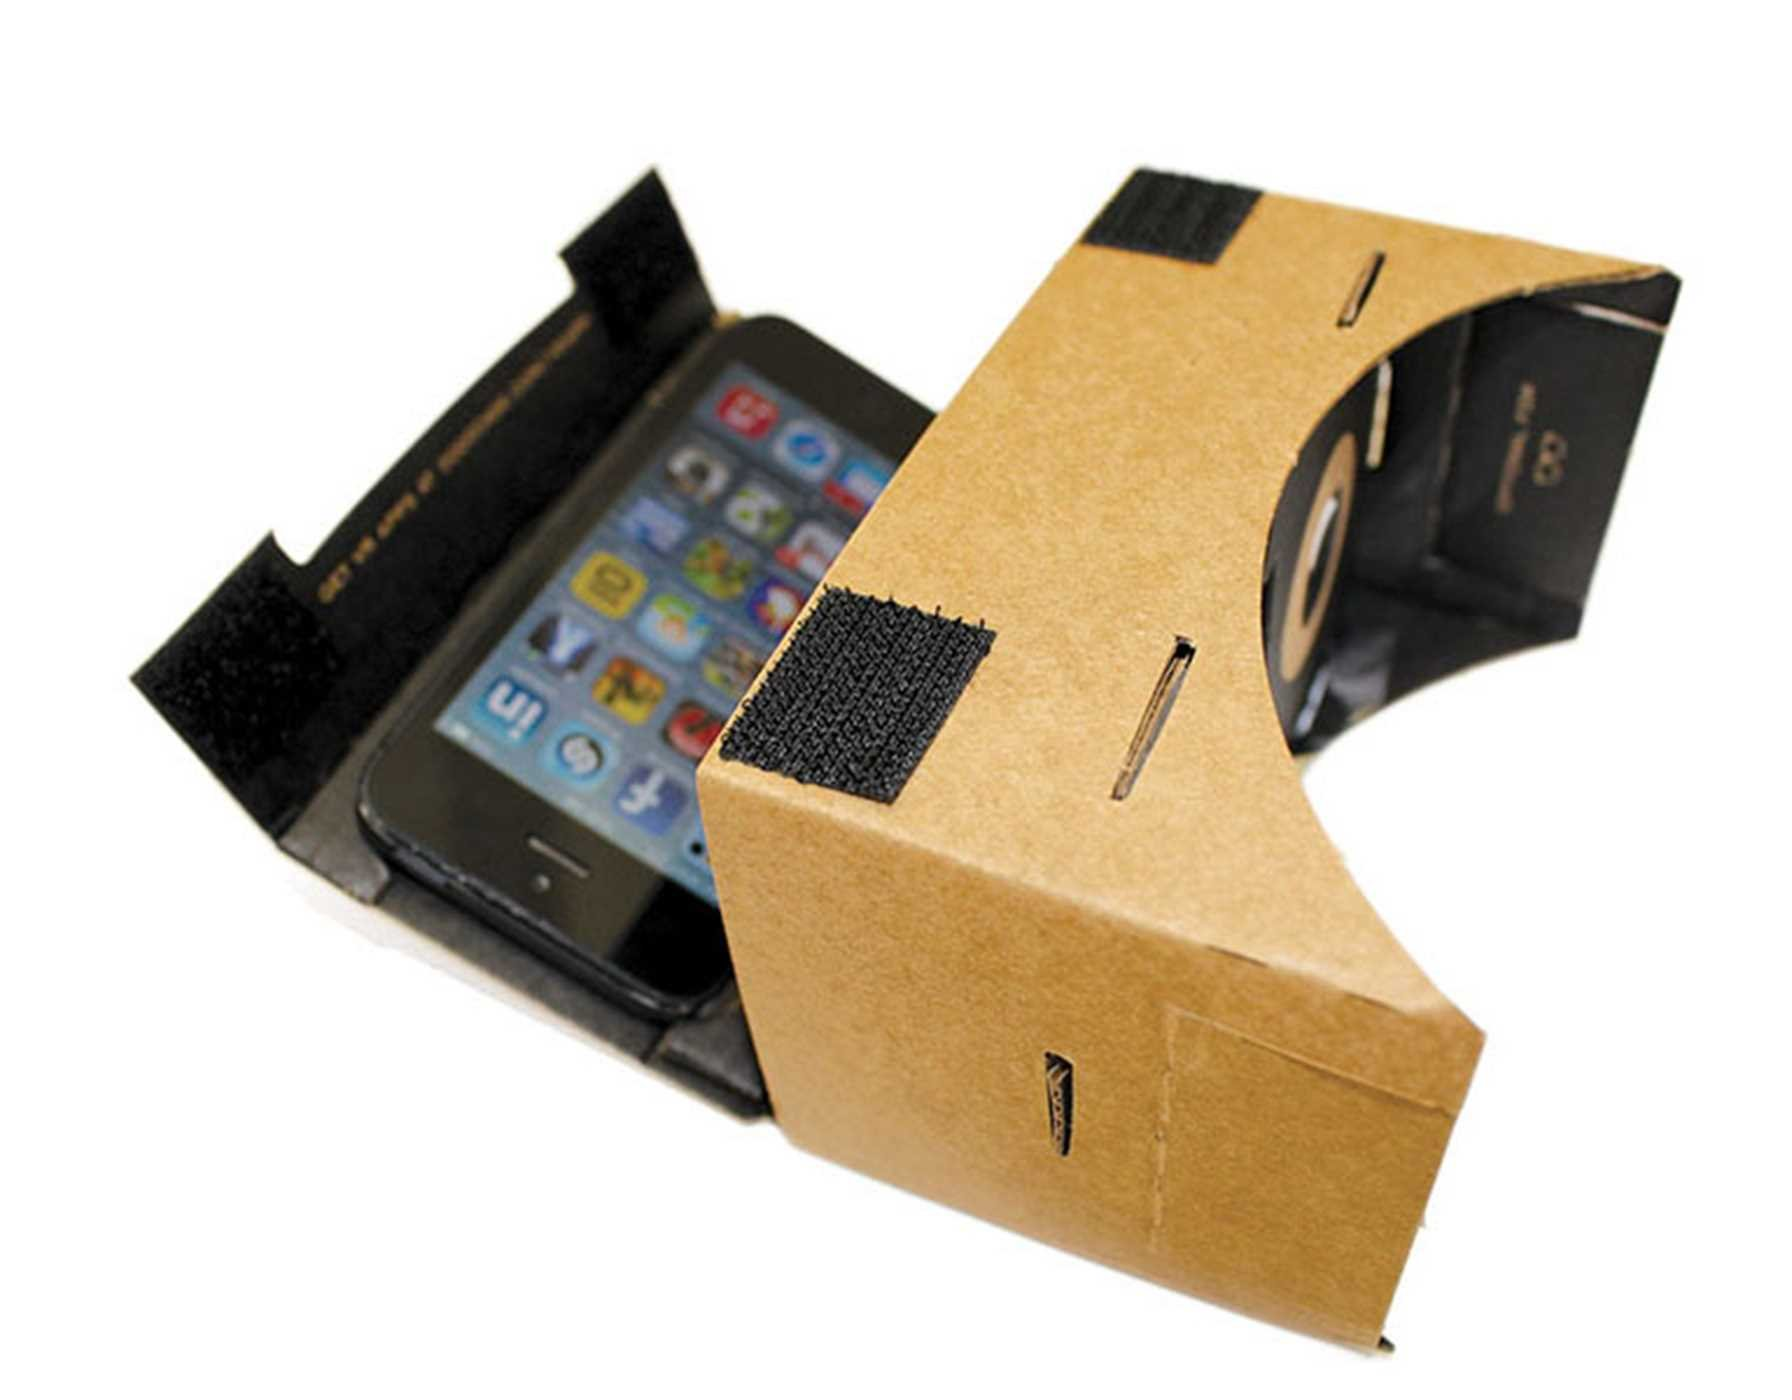 Virtual reality beginners guide google cardboard inspired vr virtual reality beginners guide google cardboard inspired vr viewer patrick buckley frederic lardinois dodocase 9781941393109 amazon books publicscrutiny Image collections